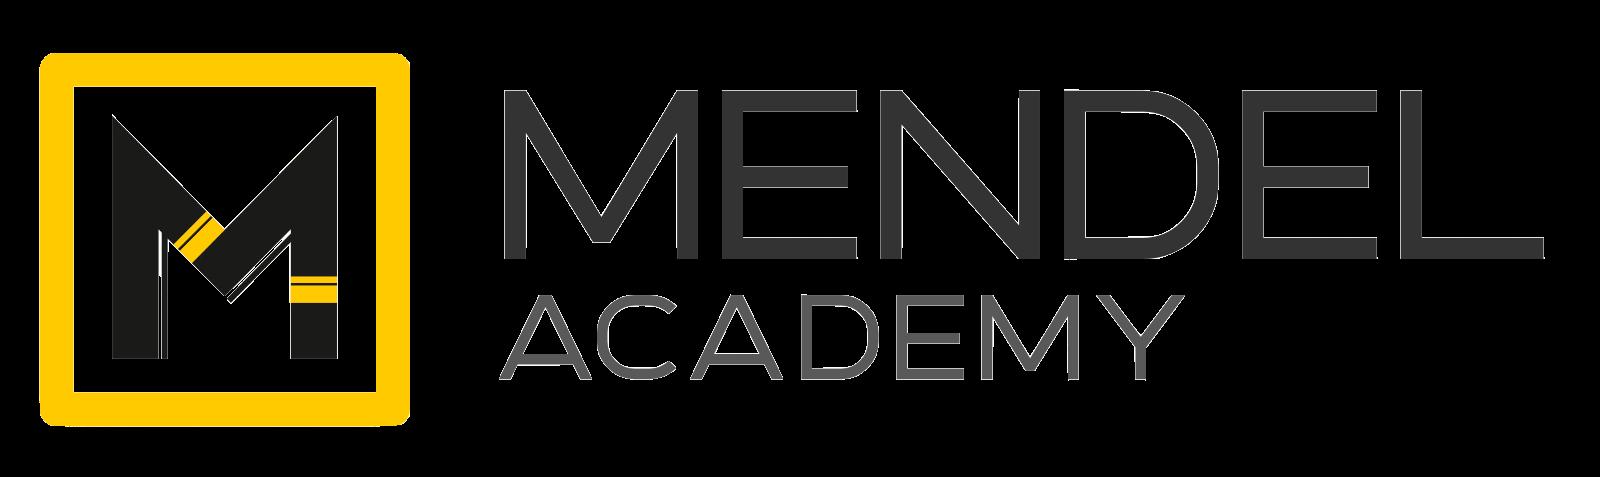 mendel academy logo